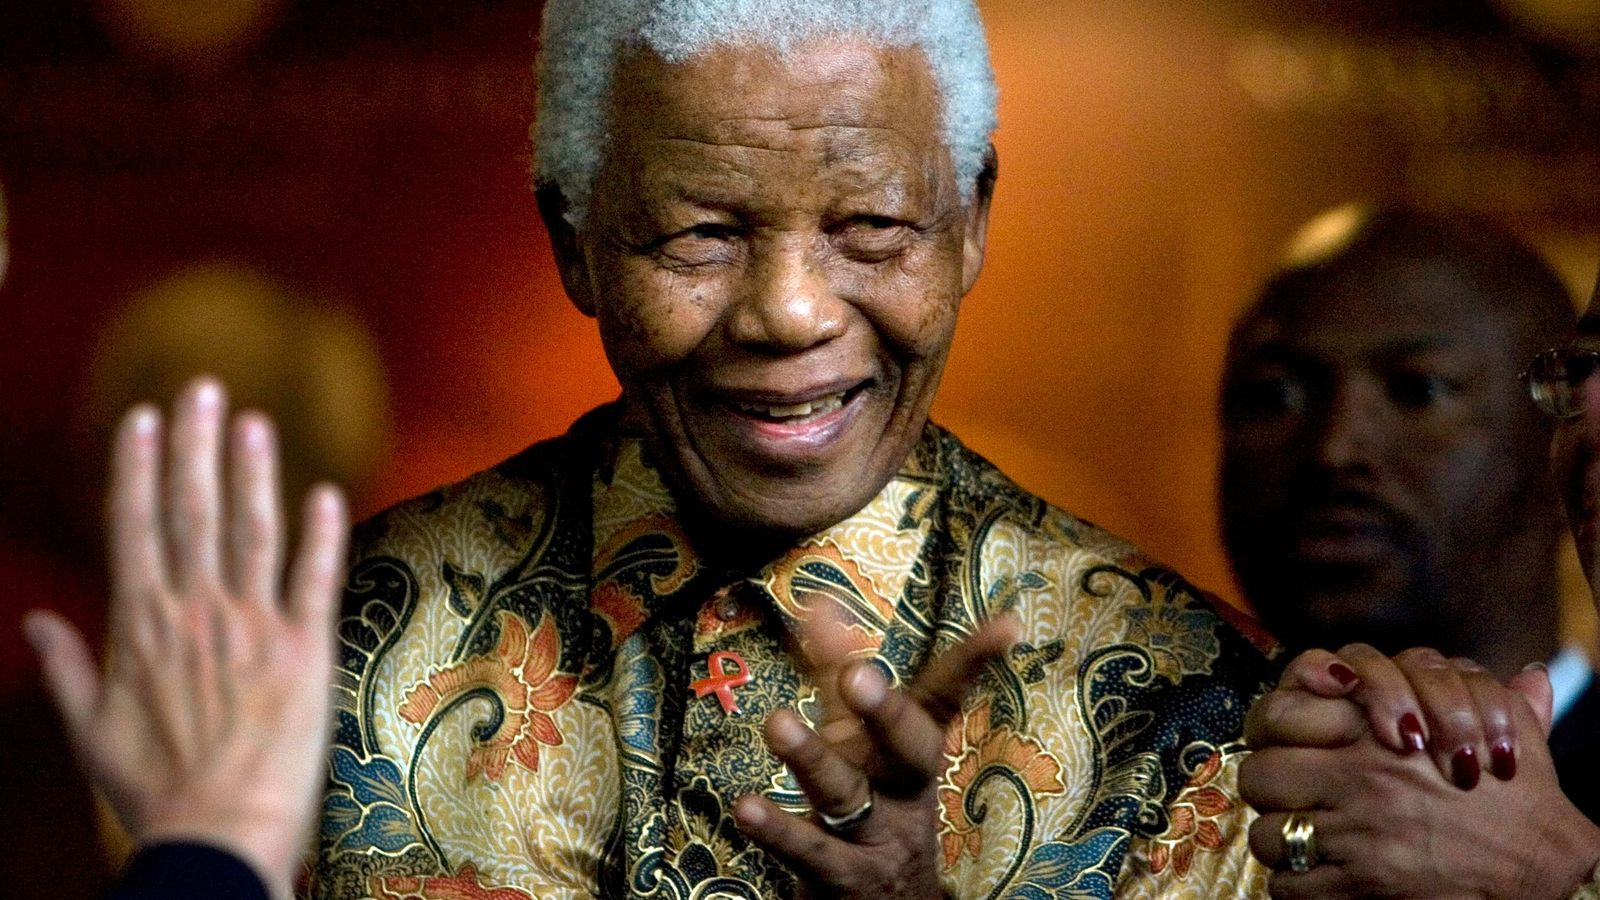 Mandela in Retirement